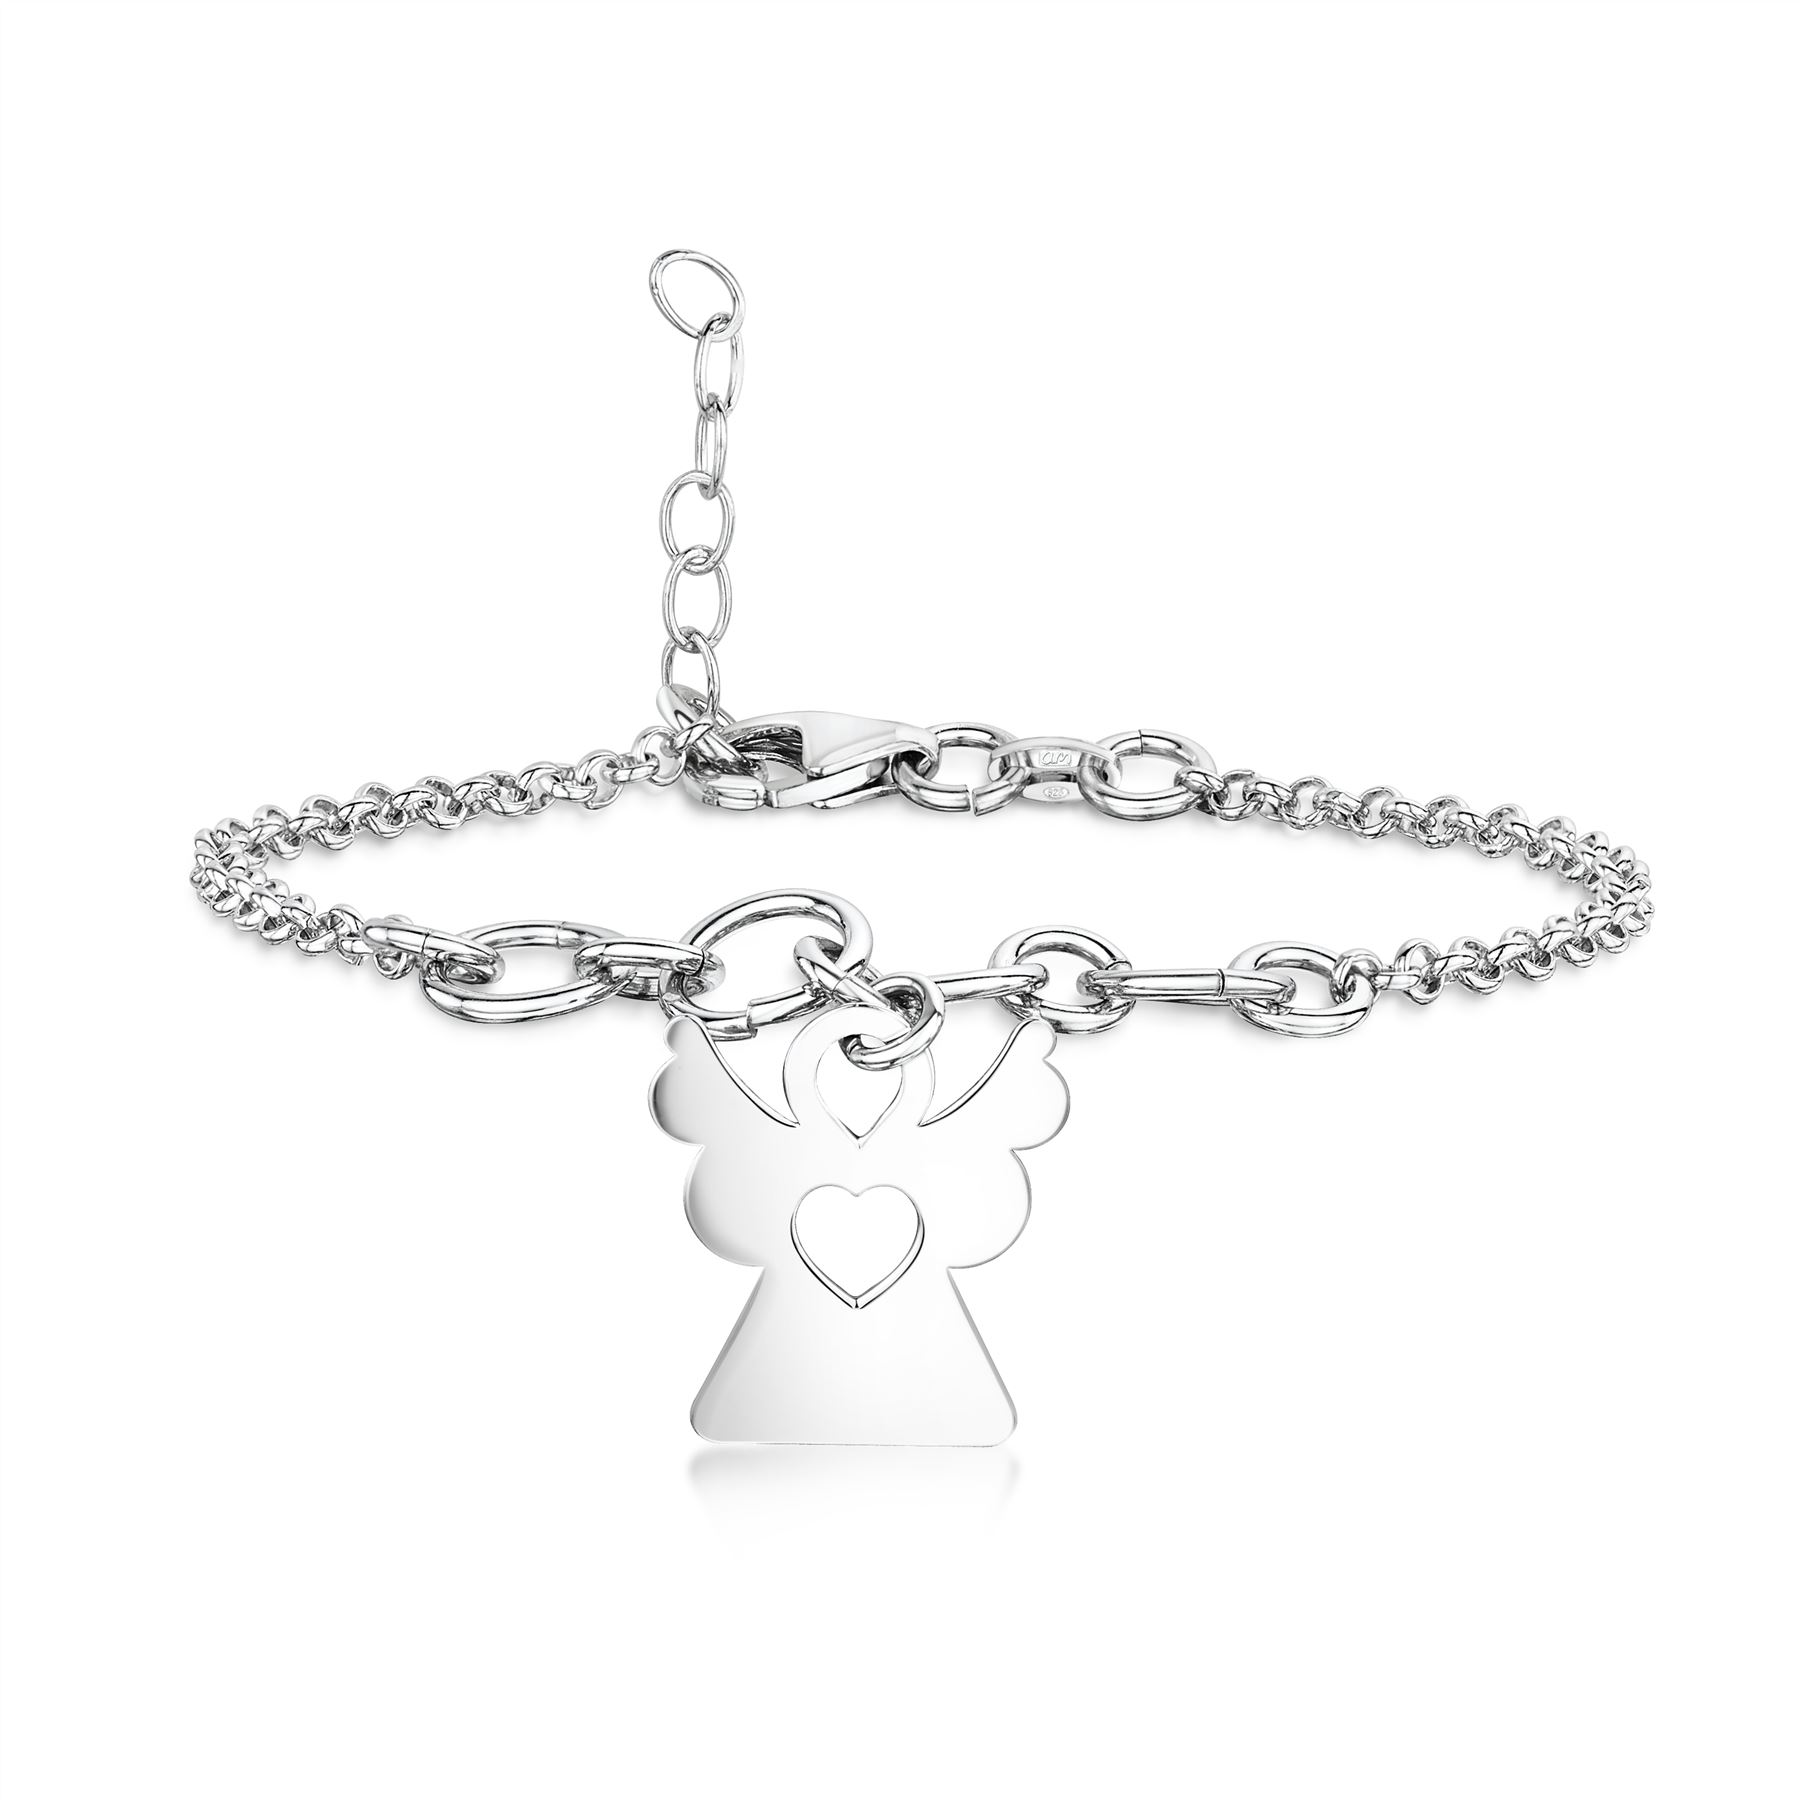 Amberta-Jewelry-925-Sterling-Silver-Adjustable-Bracelet-Italian-Bangle-for-Women thumbnail 66